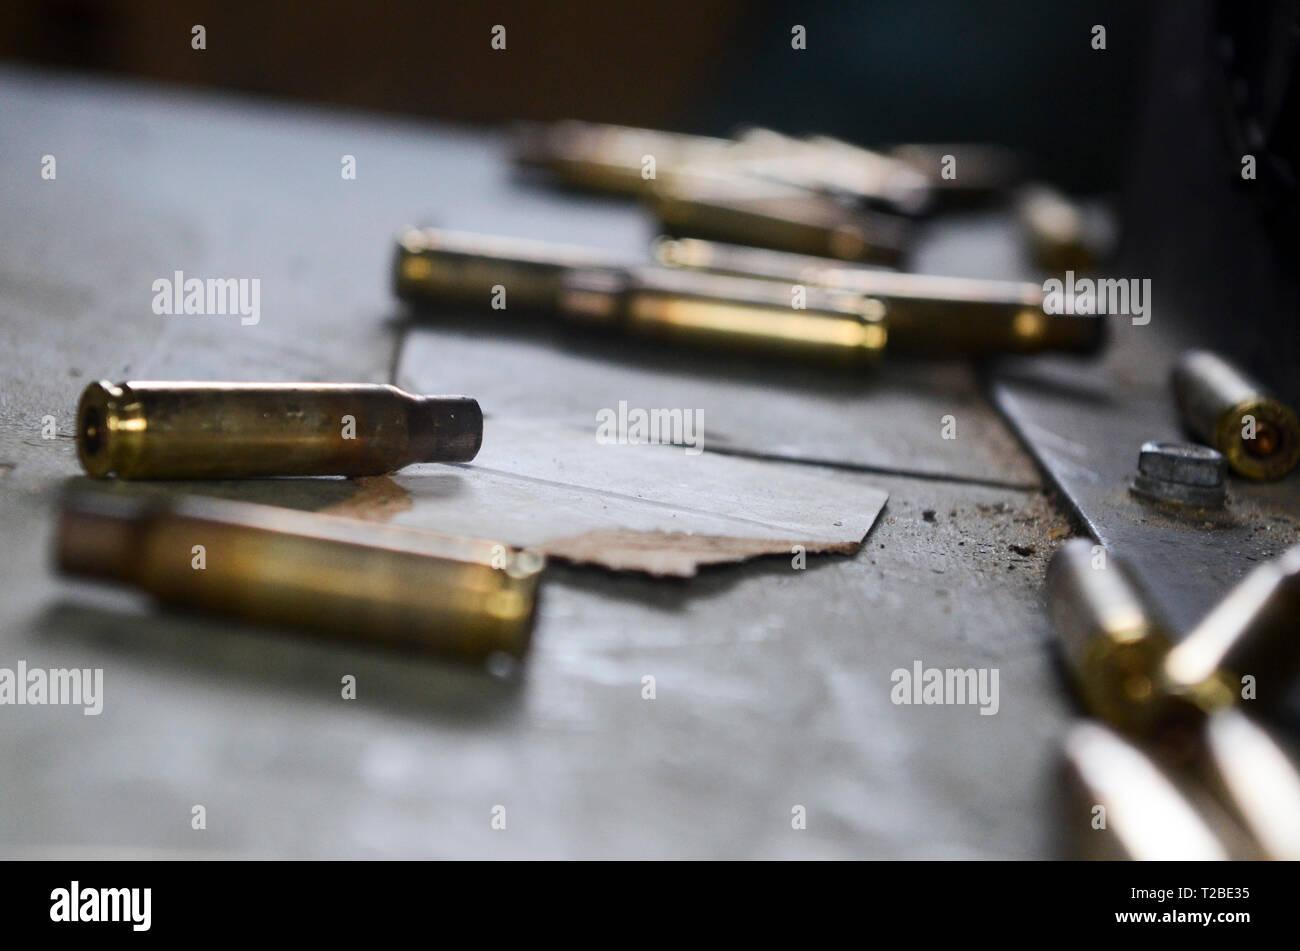 Lee EZ X EXP 30 CAL Medium ricarico Shooting Pistola Fucile AP